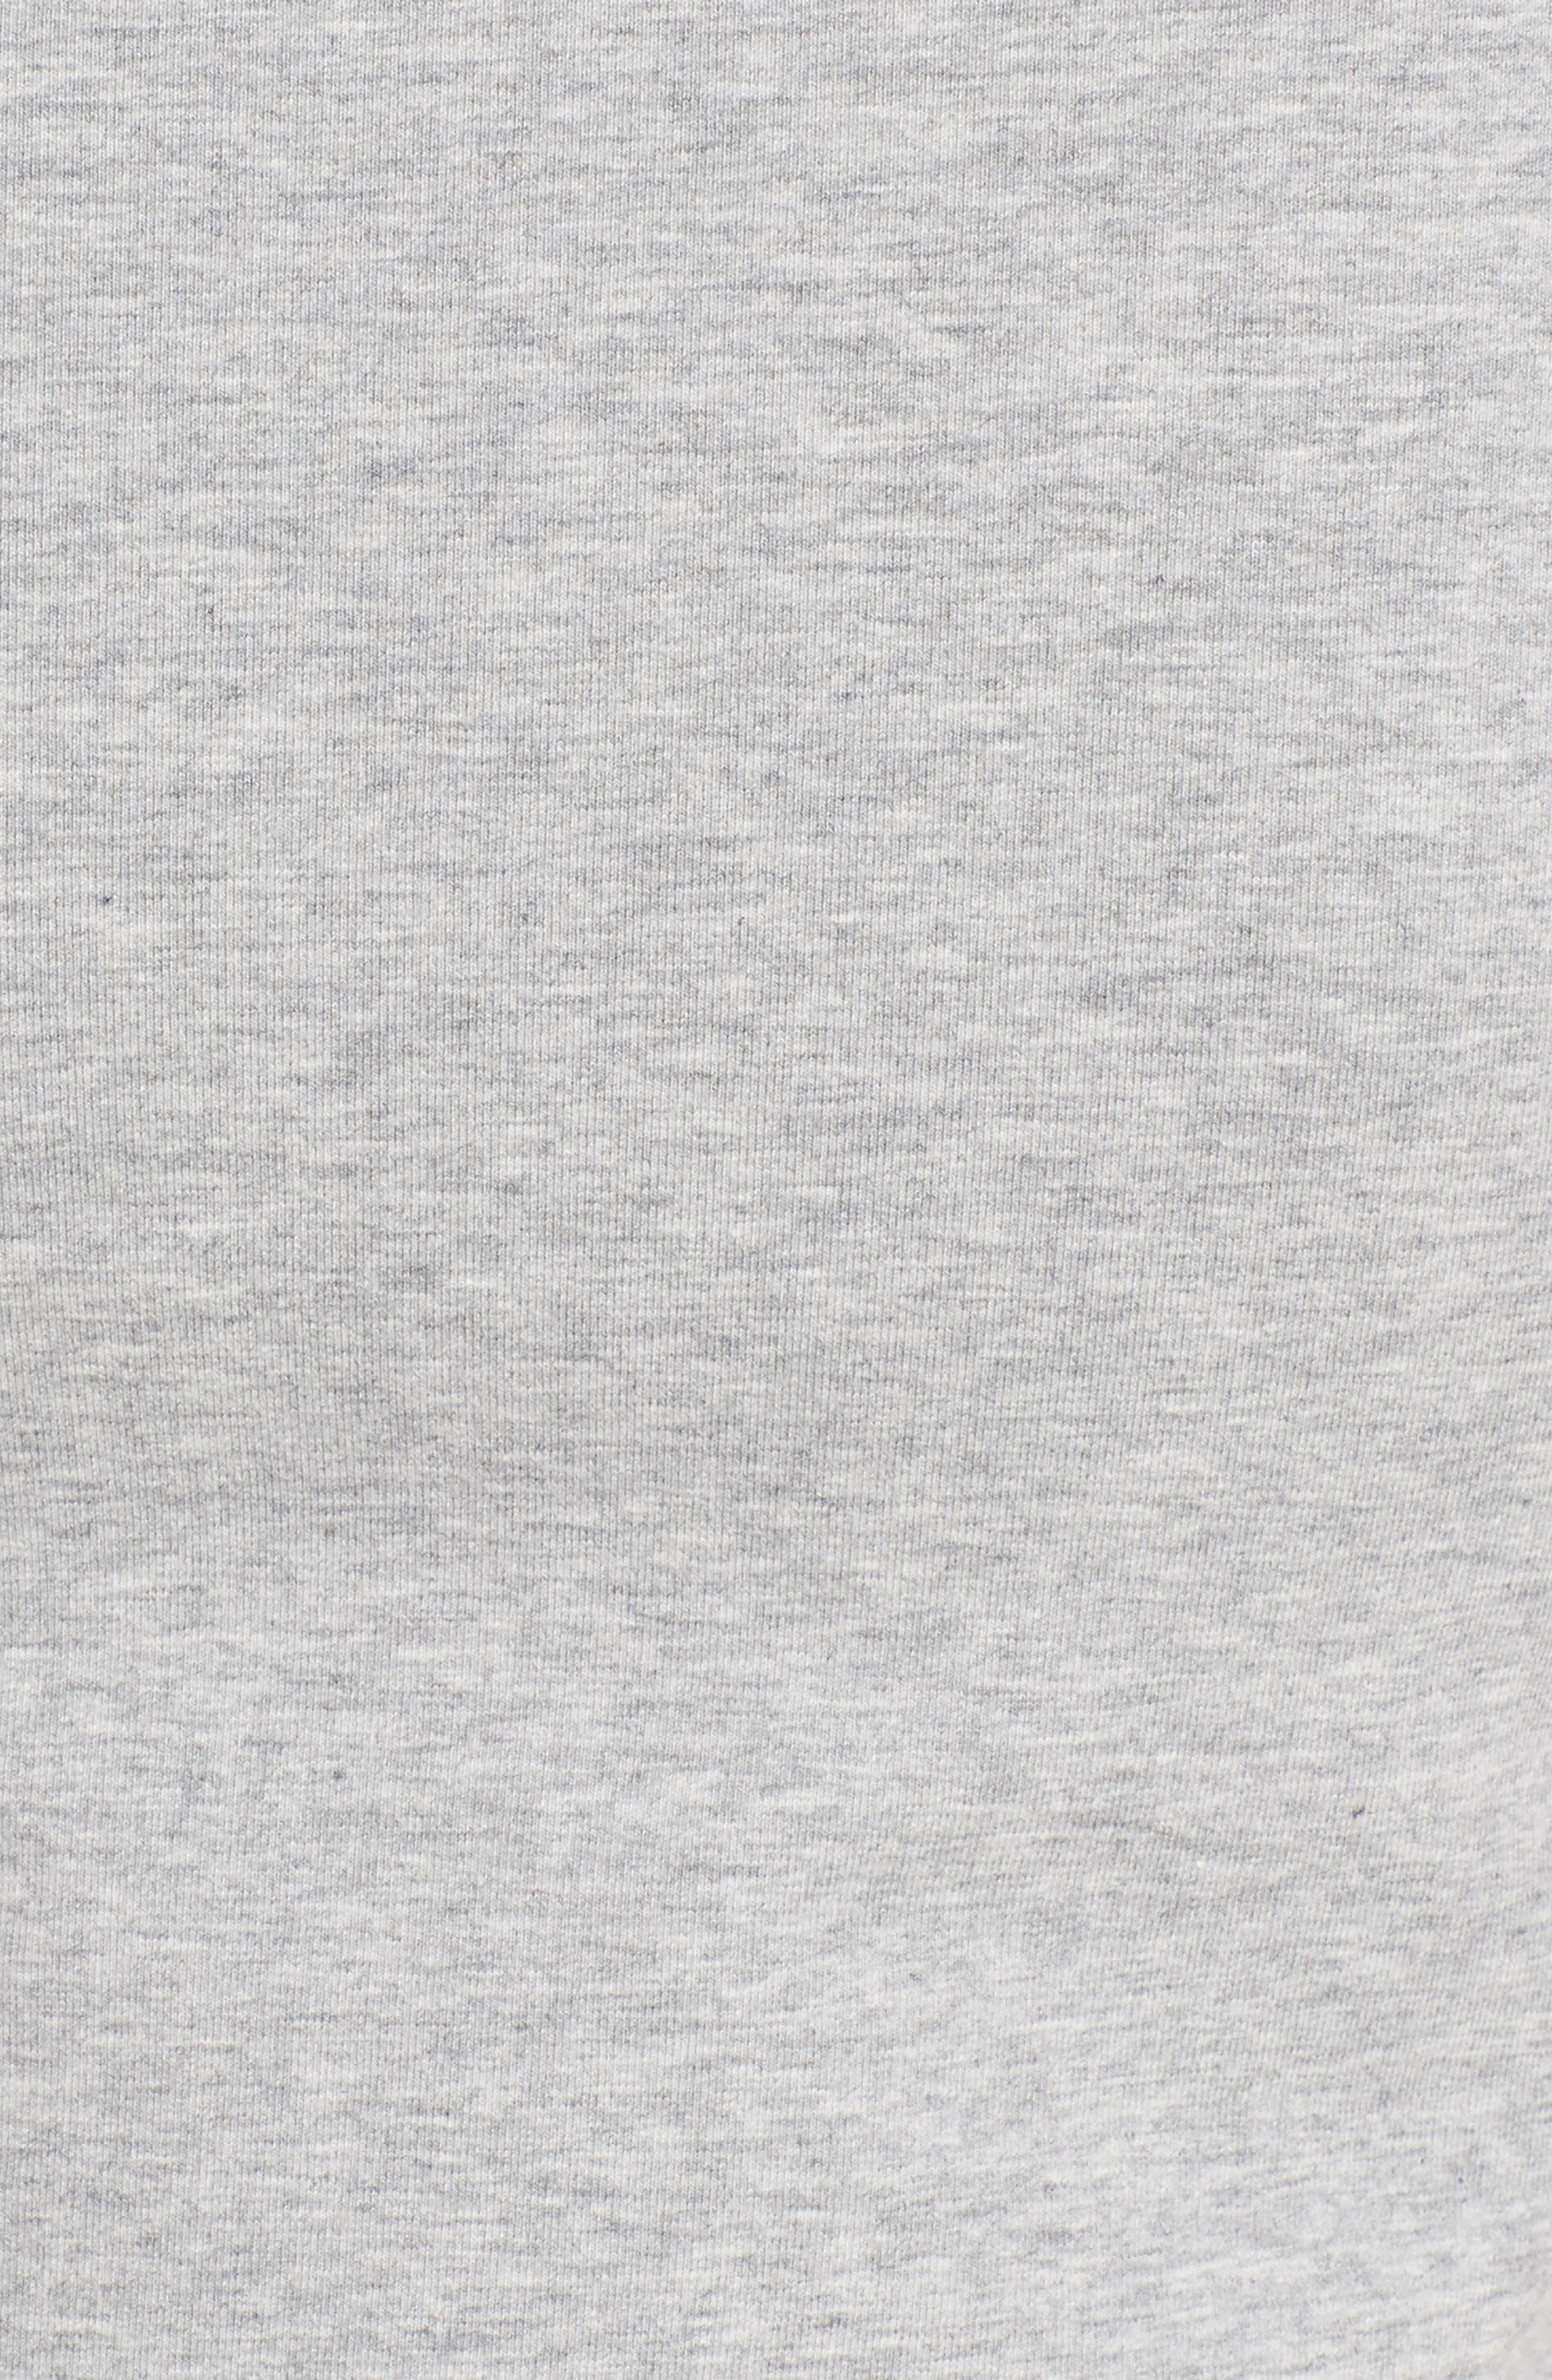 Lace-Up Sweatshirt,                             Alternate thumbnail 5, color,                             Grey Heather